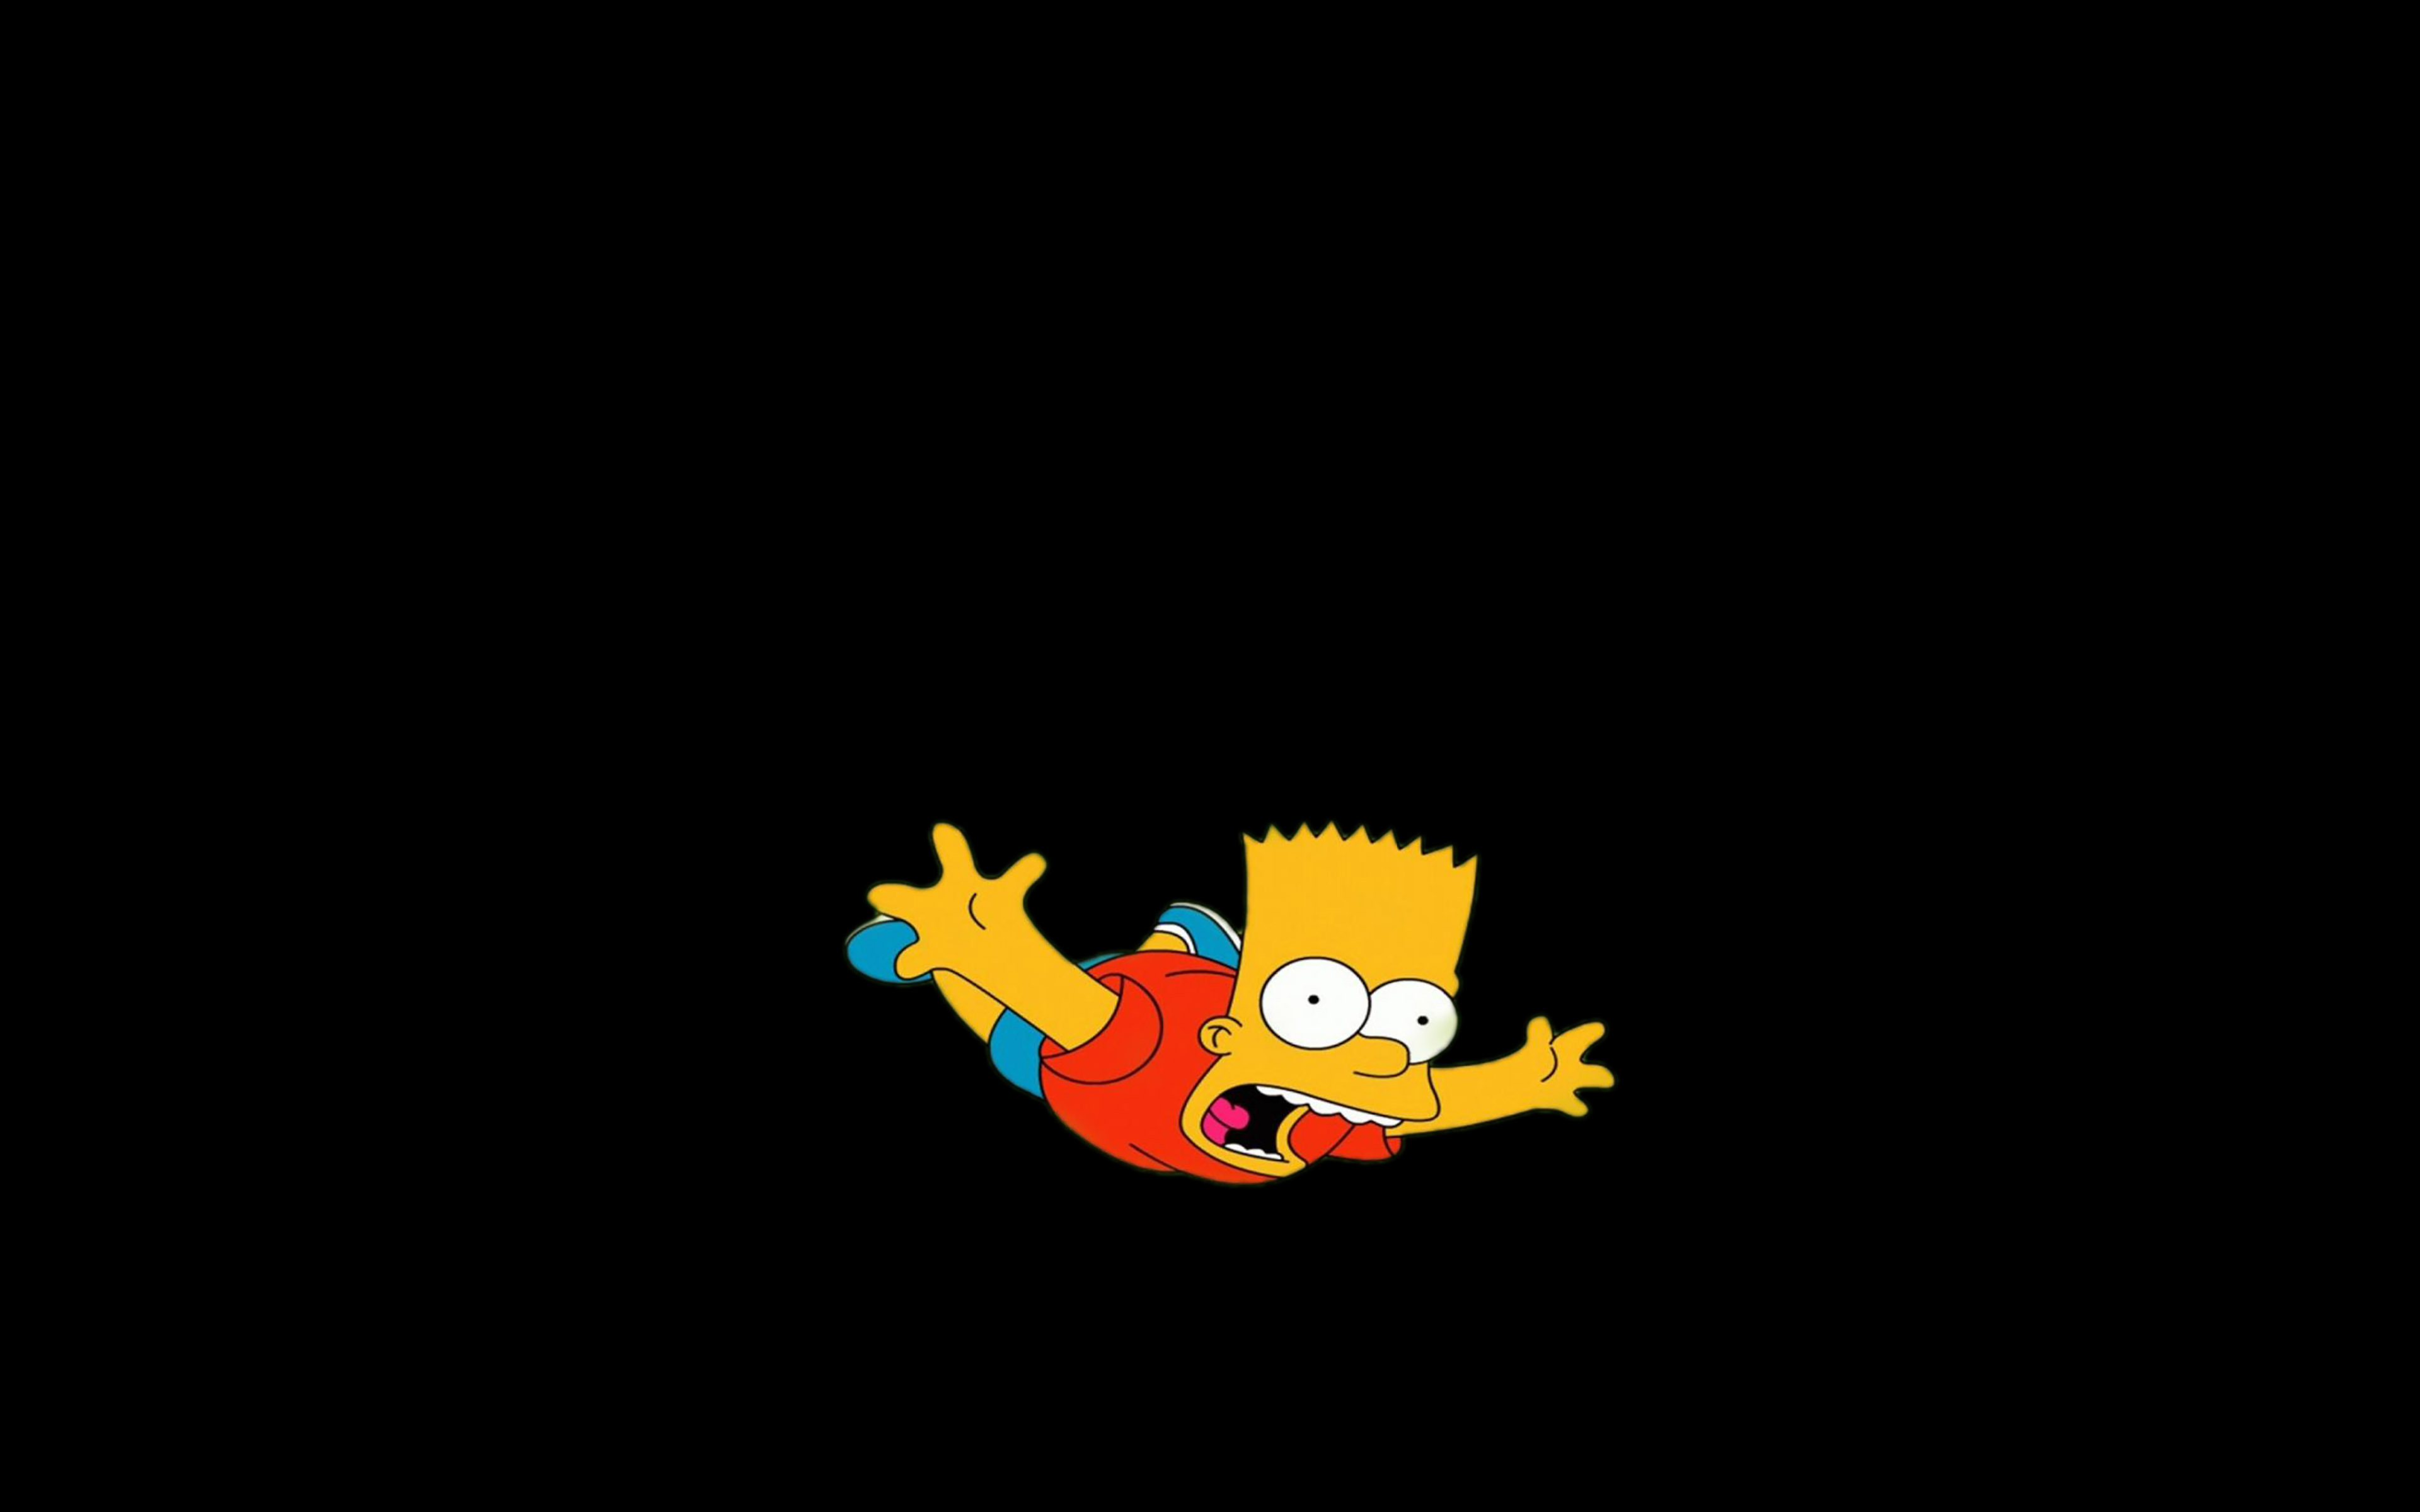 Cute Bokeh Wallpaper Ag70 Bart Simpson Funny Cute Illlust Papers Co